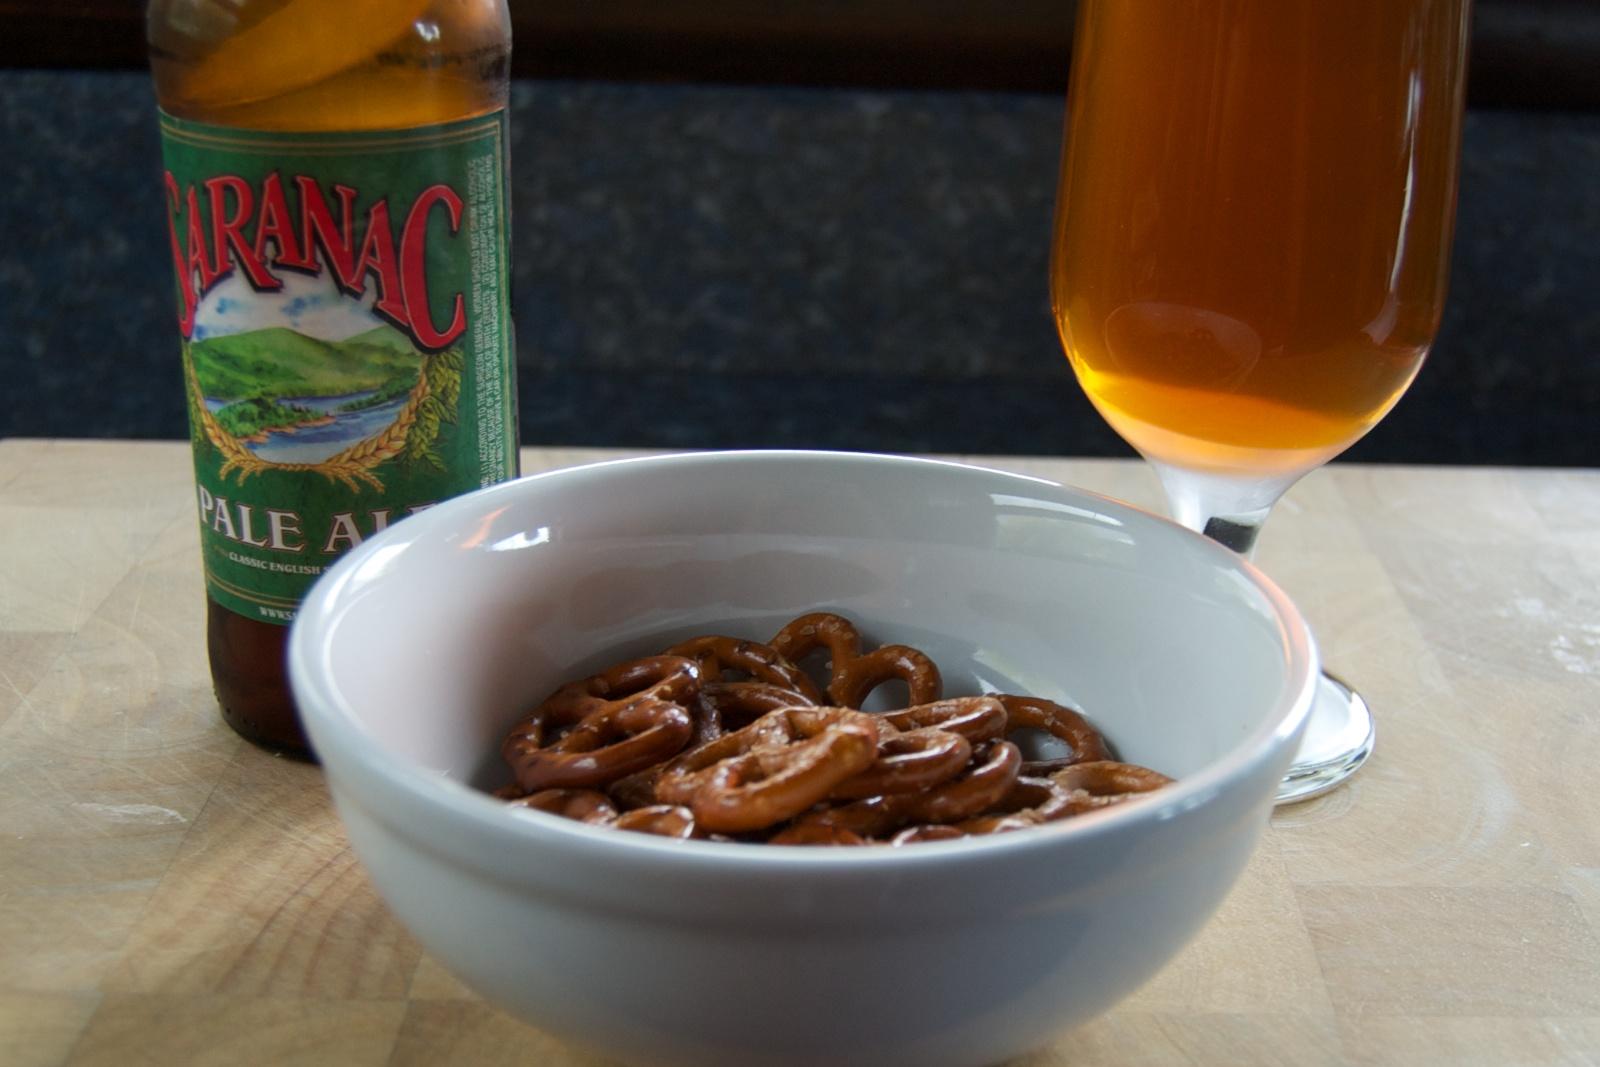 http://blog.rickk.com/food/2012/09/30/ate.2012.09.30.s.jpg